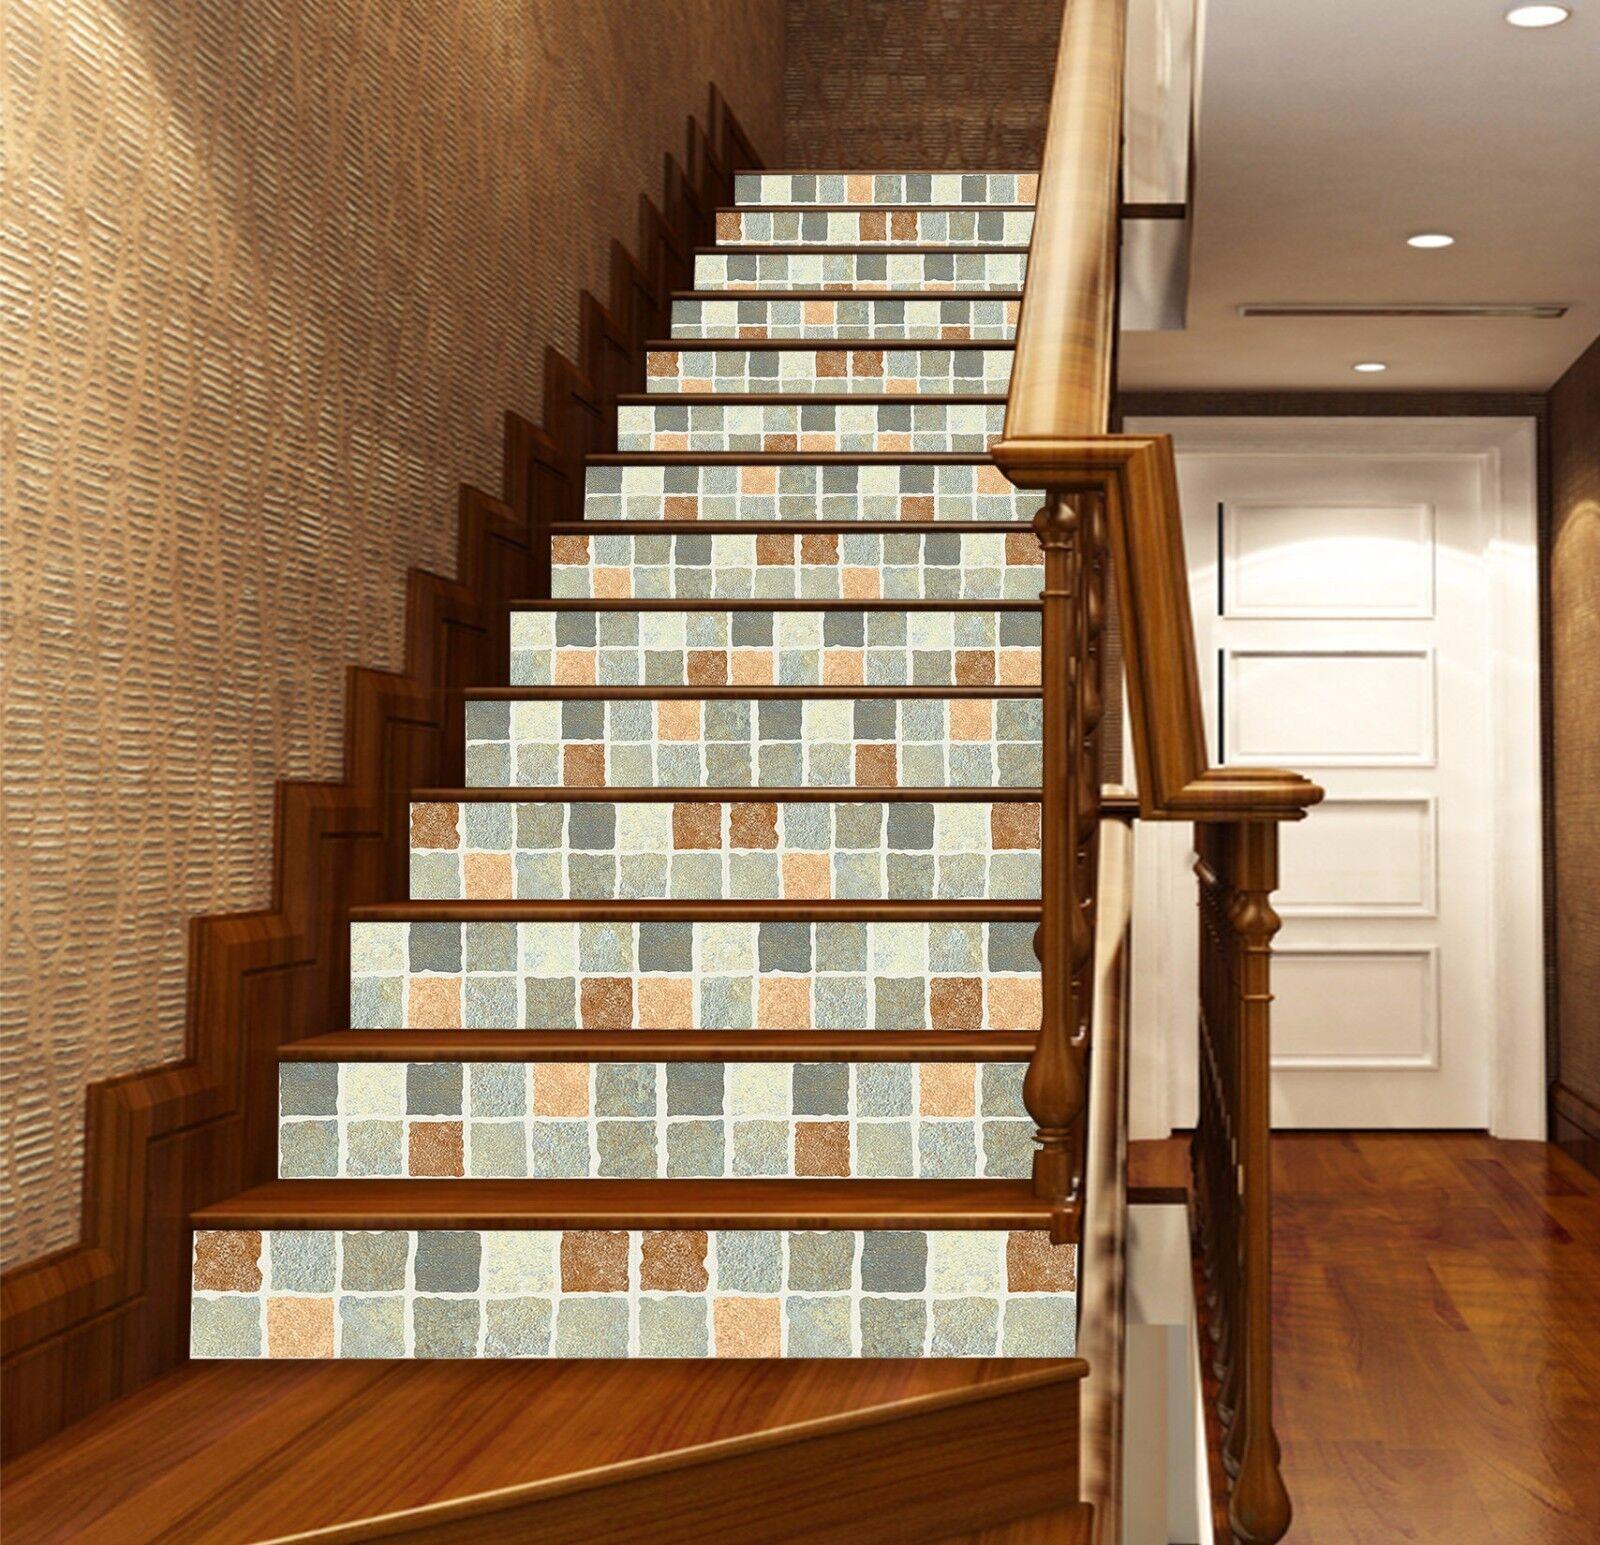 3D Gitter Ziegel 36 Stair Risers Dekoration Fototapete Vinyl Aufkleber Tapete DE